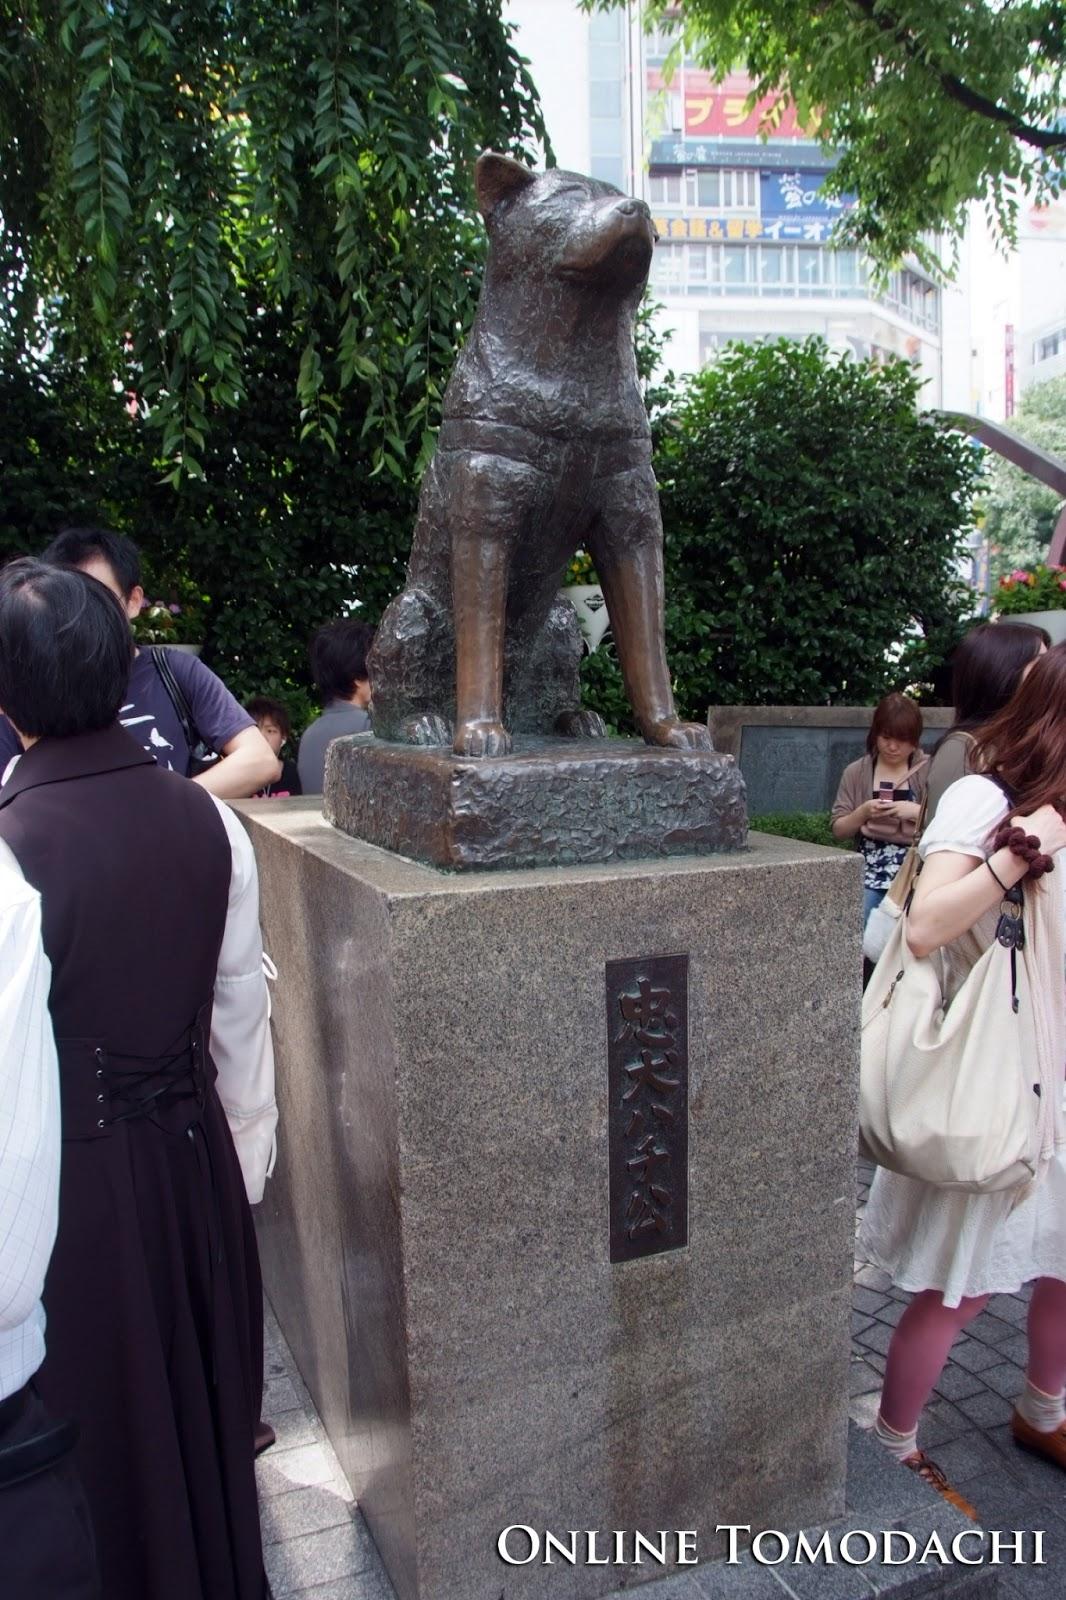 Online Tomodachi: Hachiko Statue